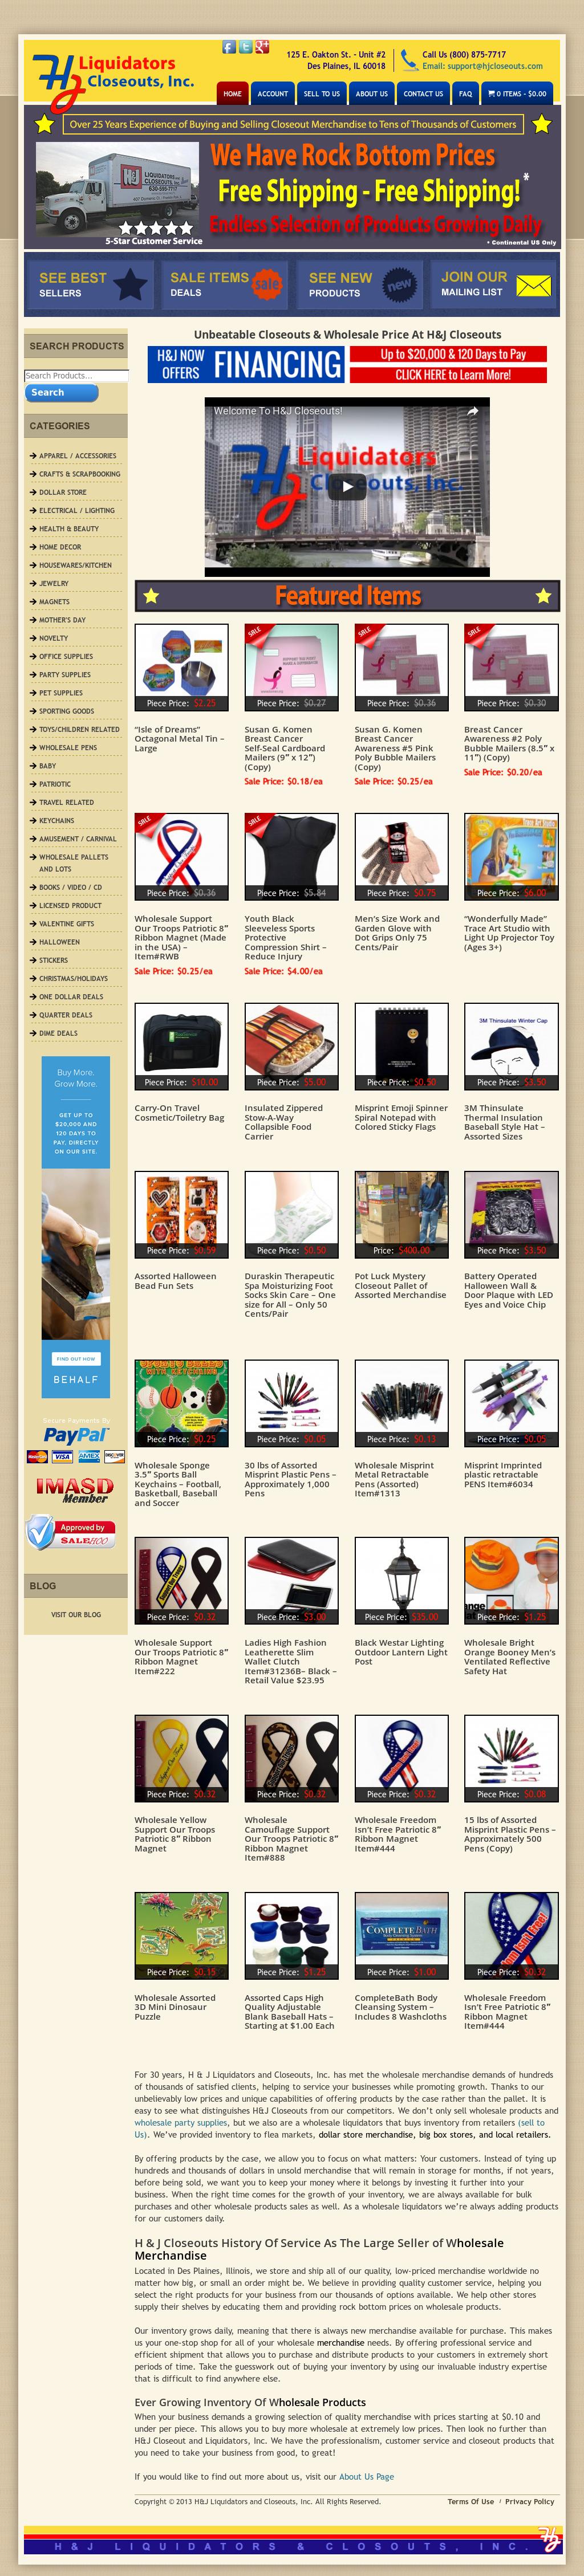 H & J Liquidators And Closeouts, Inc  - Wholesale Product